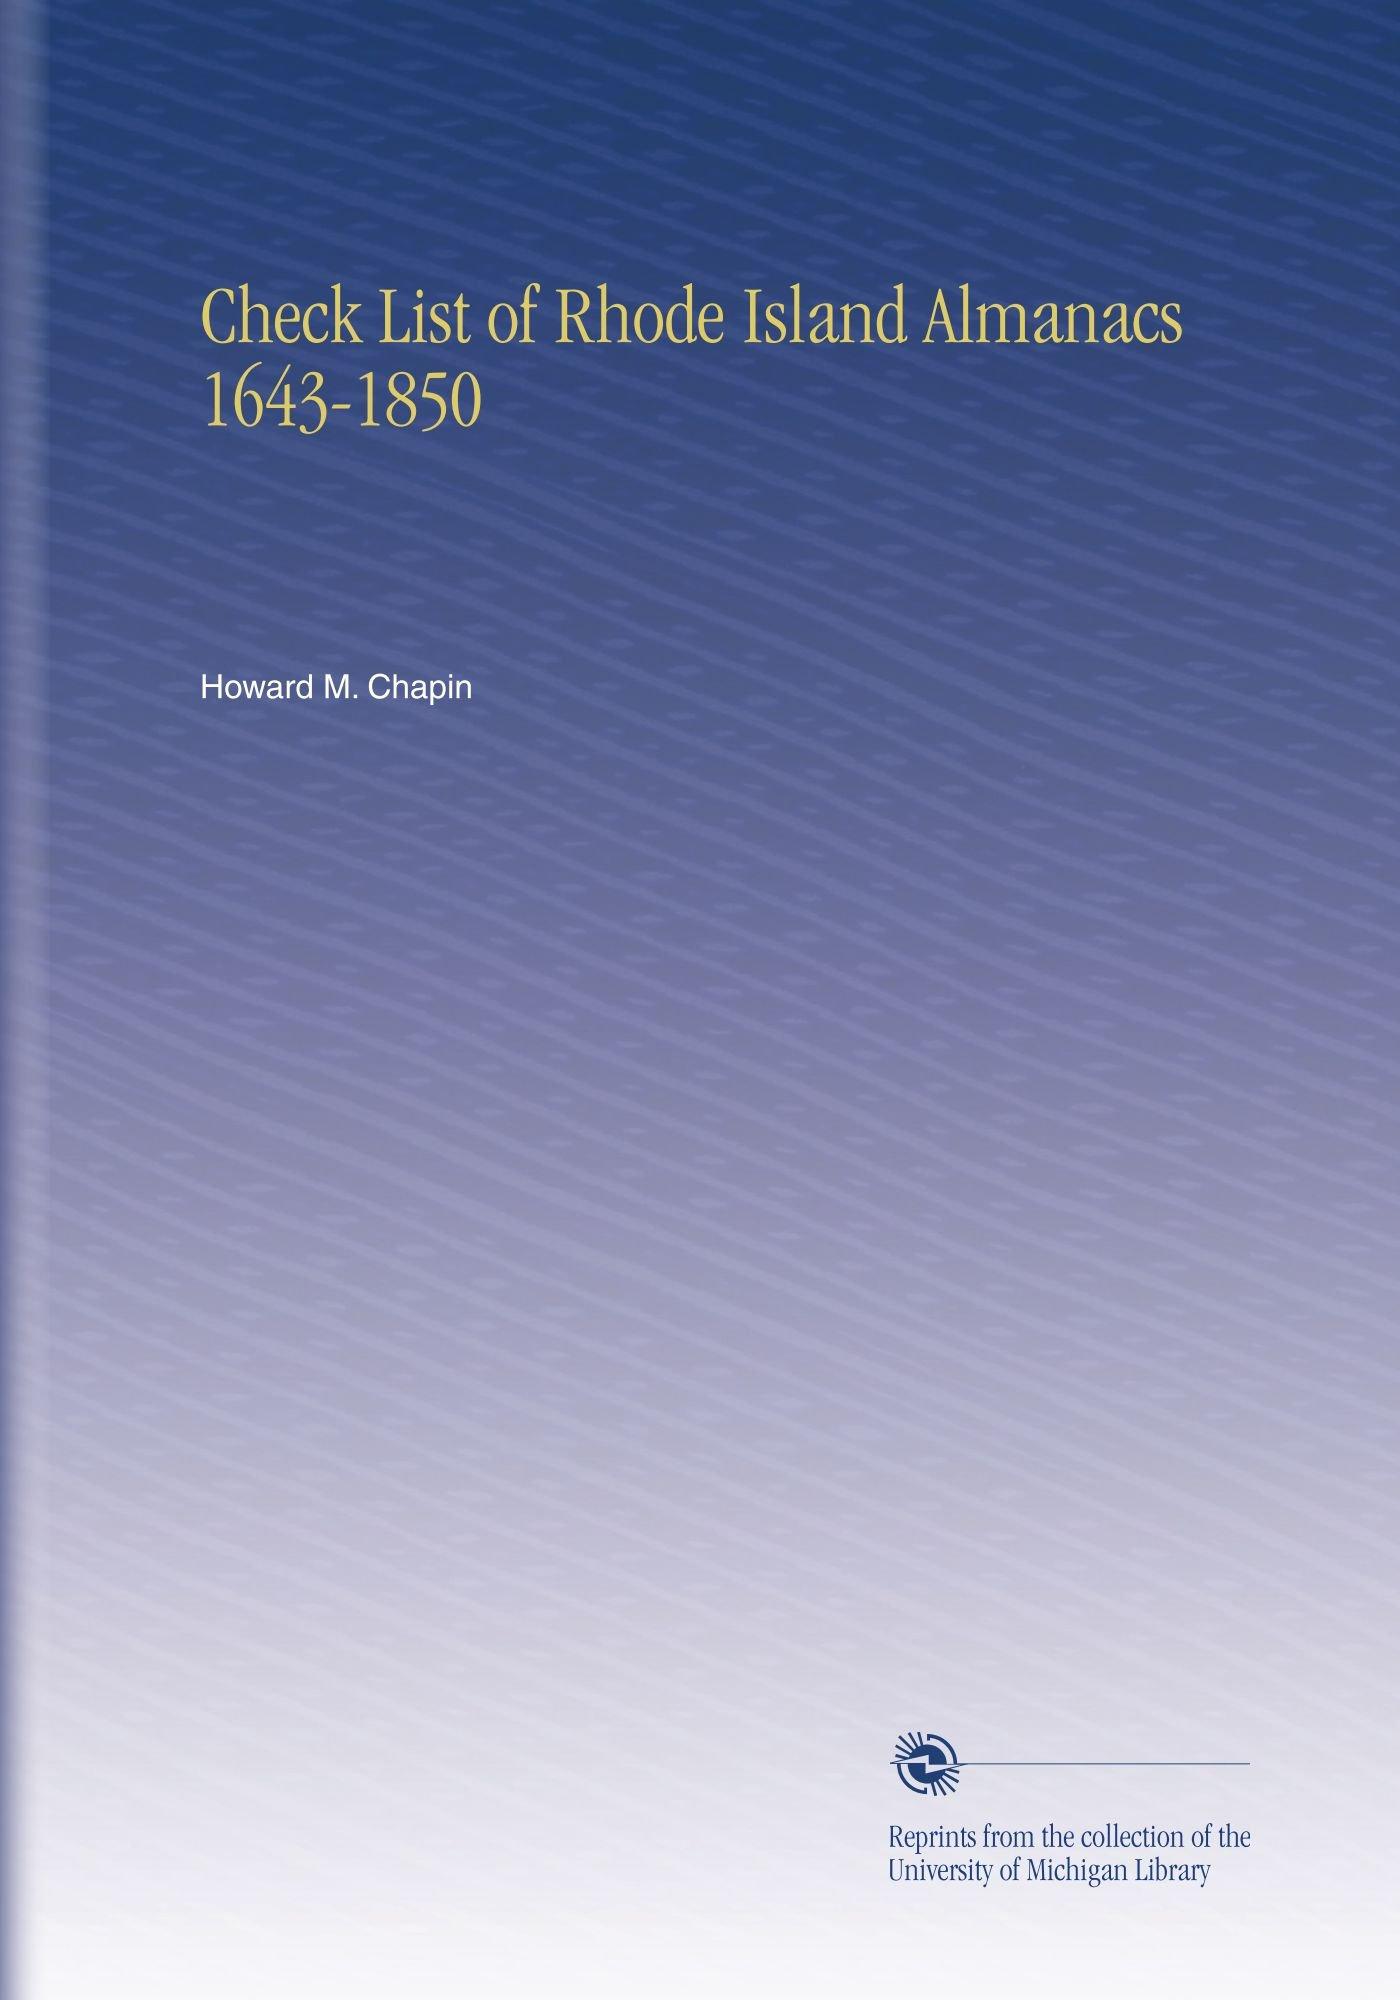 Check List of Rhode Island Almanacs 1643-1850 ePub fb2 book